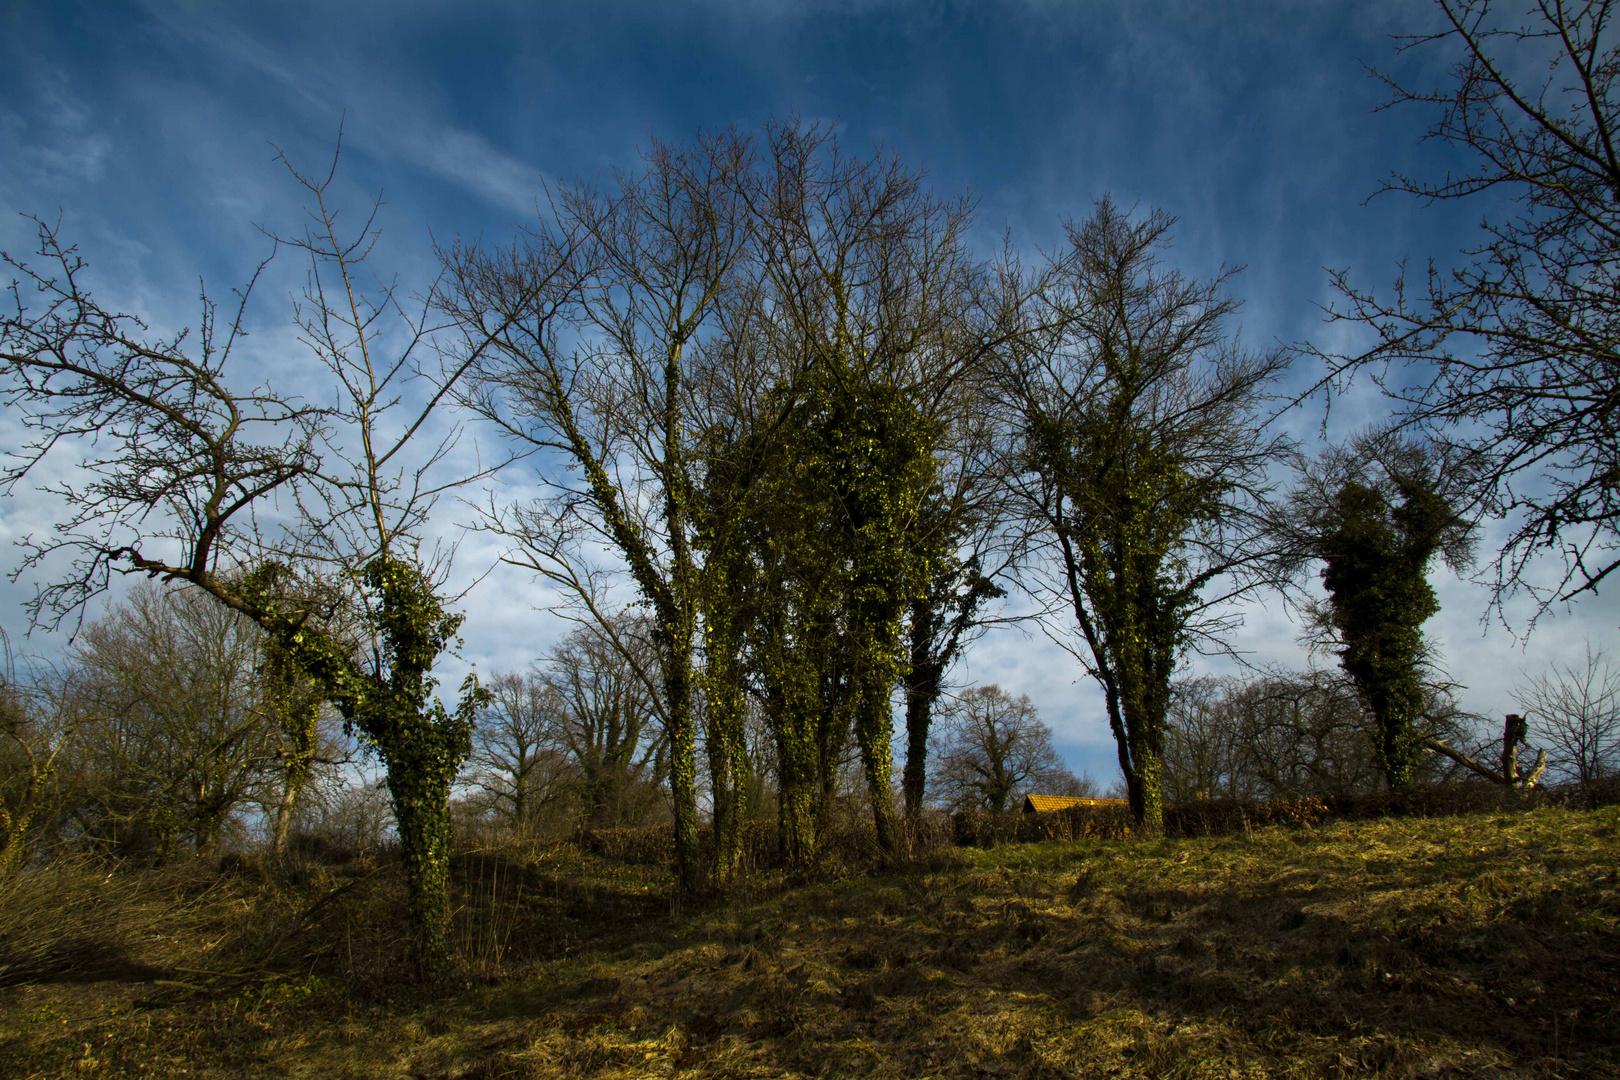 Bewachsene Bäume